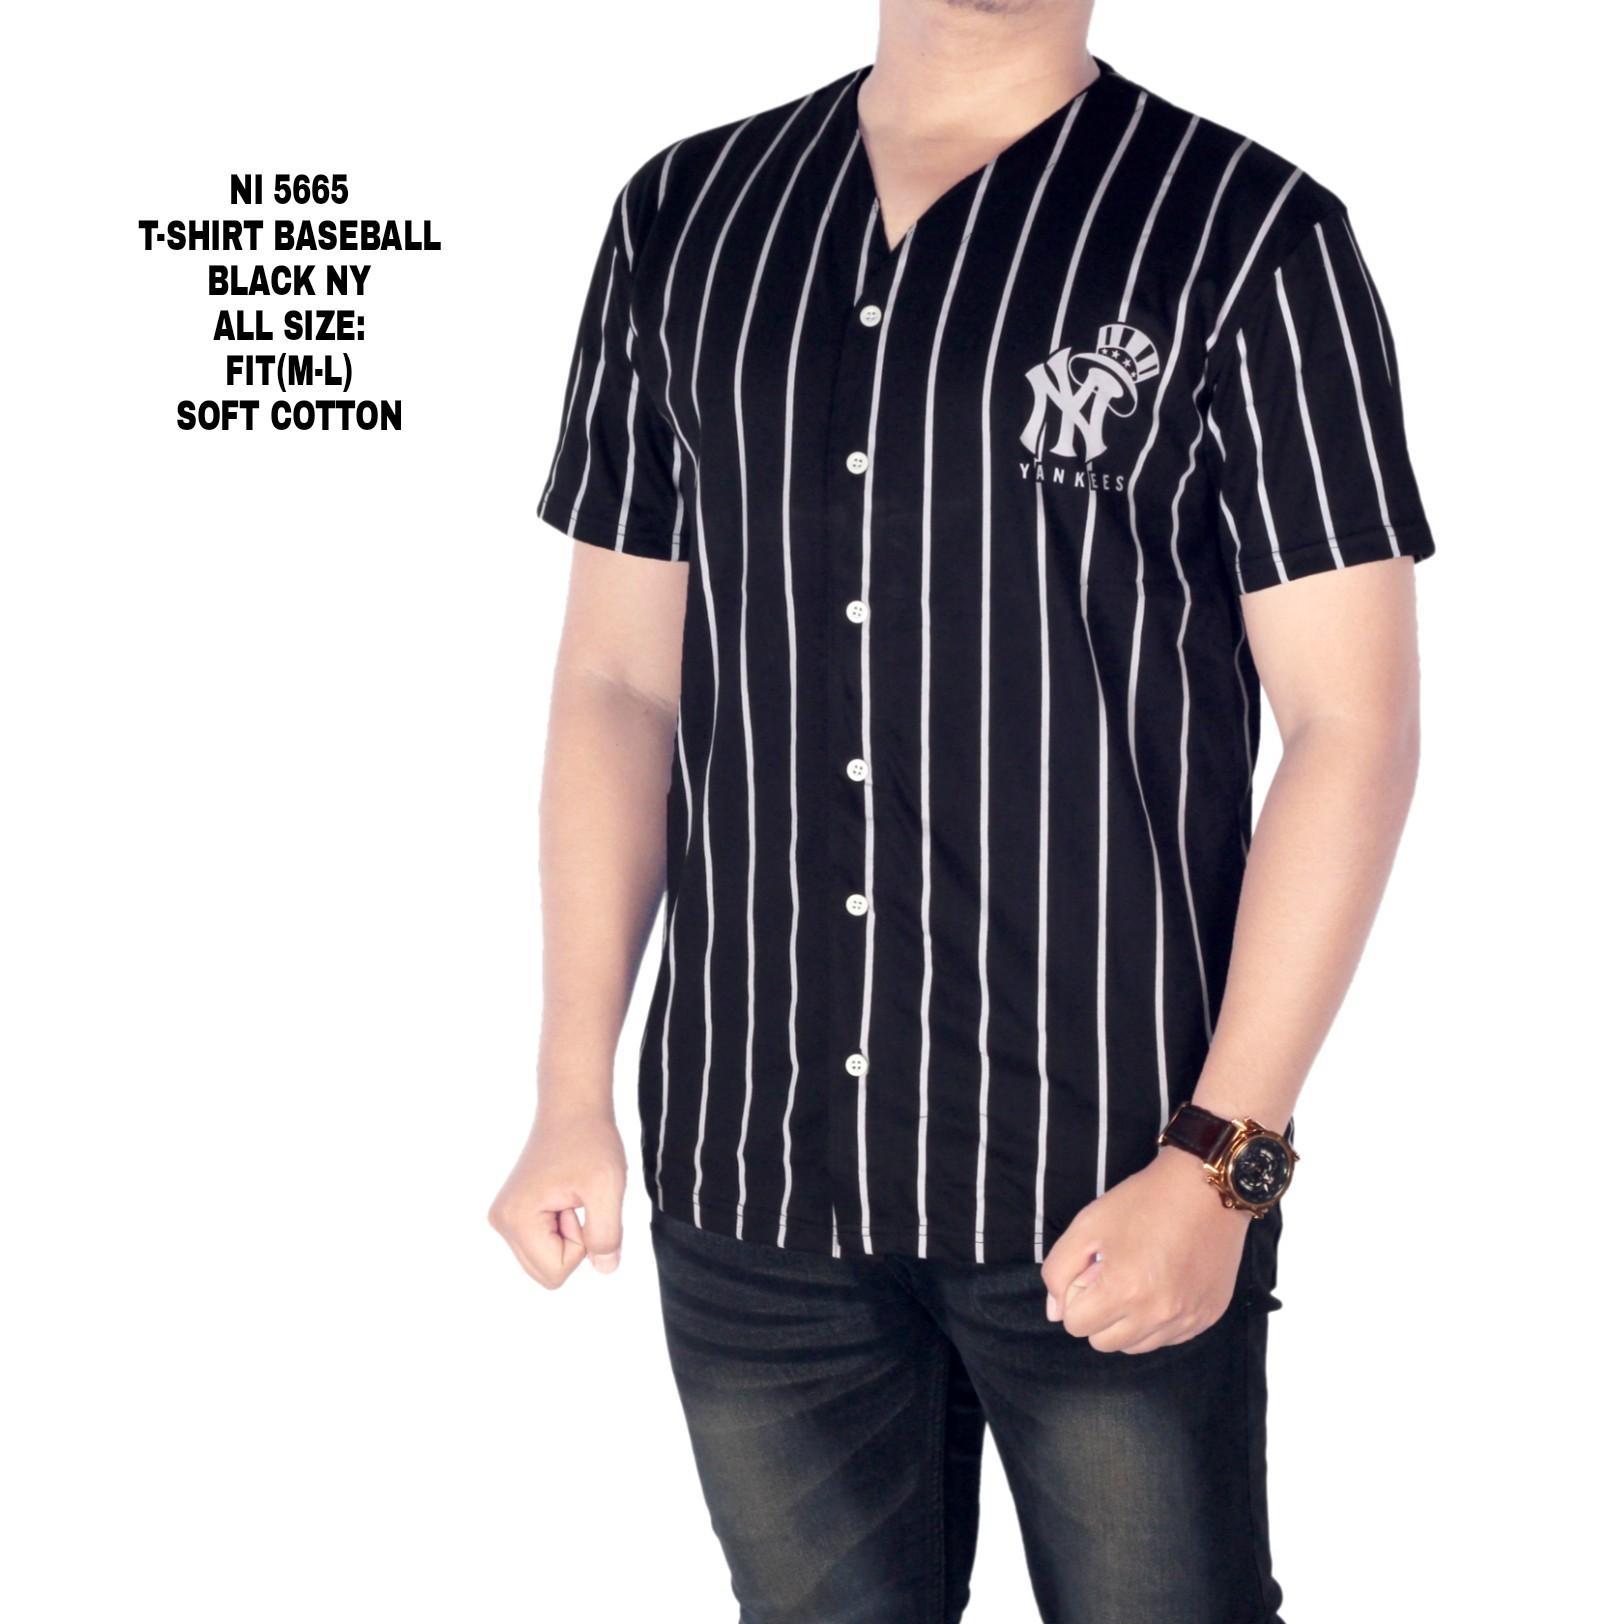 Bsg_Fashion1  Kaos Distro Young Lex/KAOS YOGS/Kaos Swag/ Kaos Long Line/Baju kaos Distro pria/baju kaos baseball/ kaos lengan pendek/ kaos pria/ baseball man/ kaos distro/ kaos lengan pendek/Kaos Polos/Kaos Oblong NI 5665